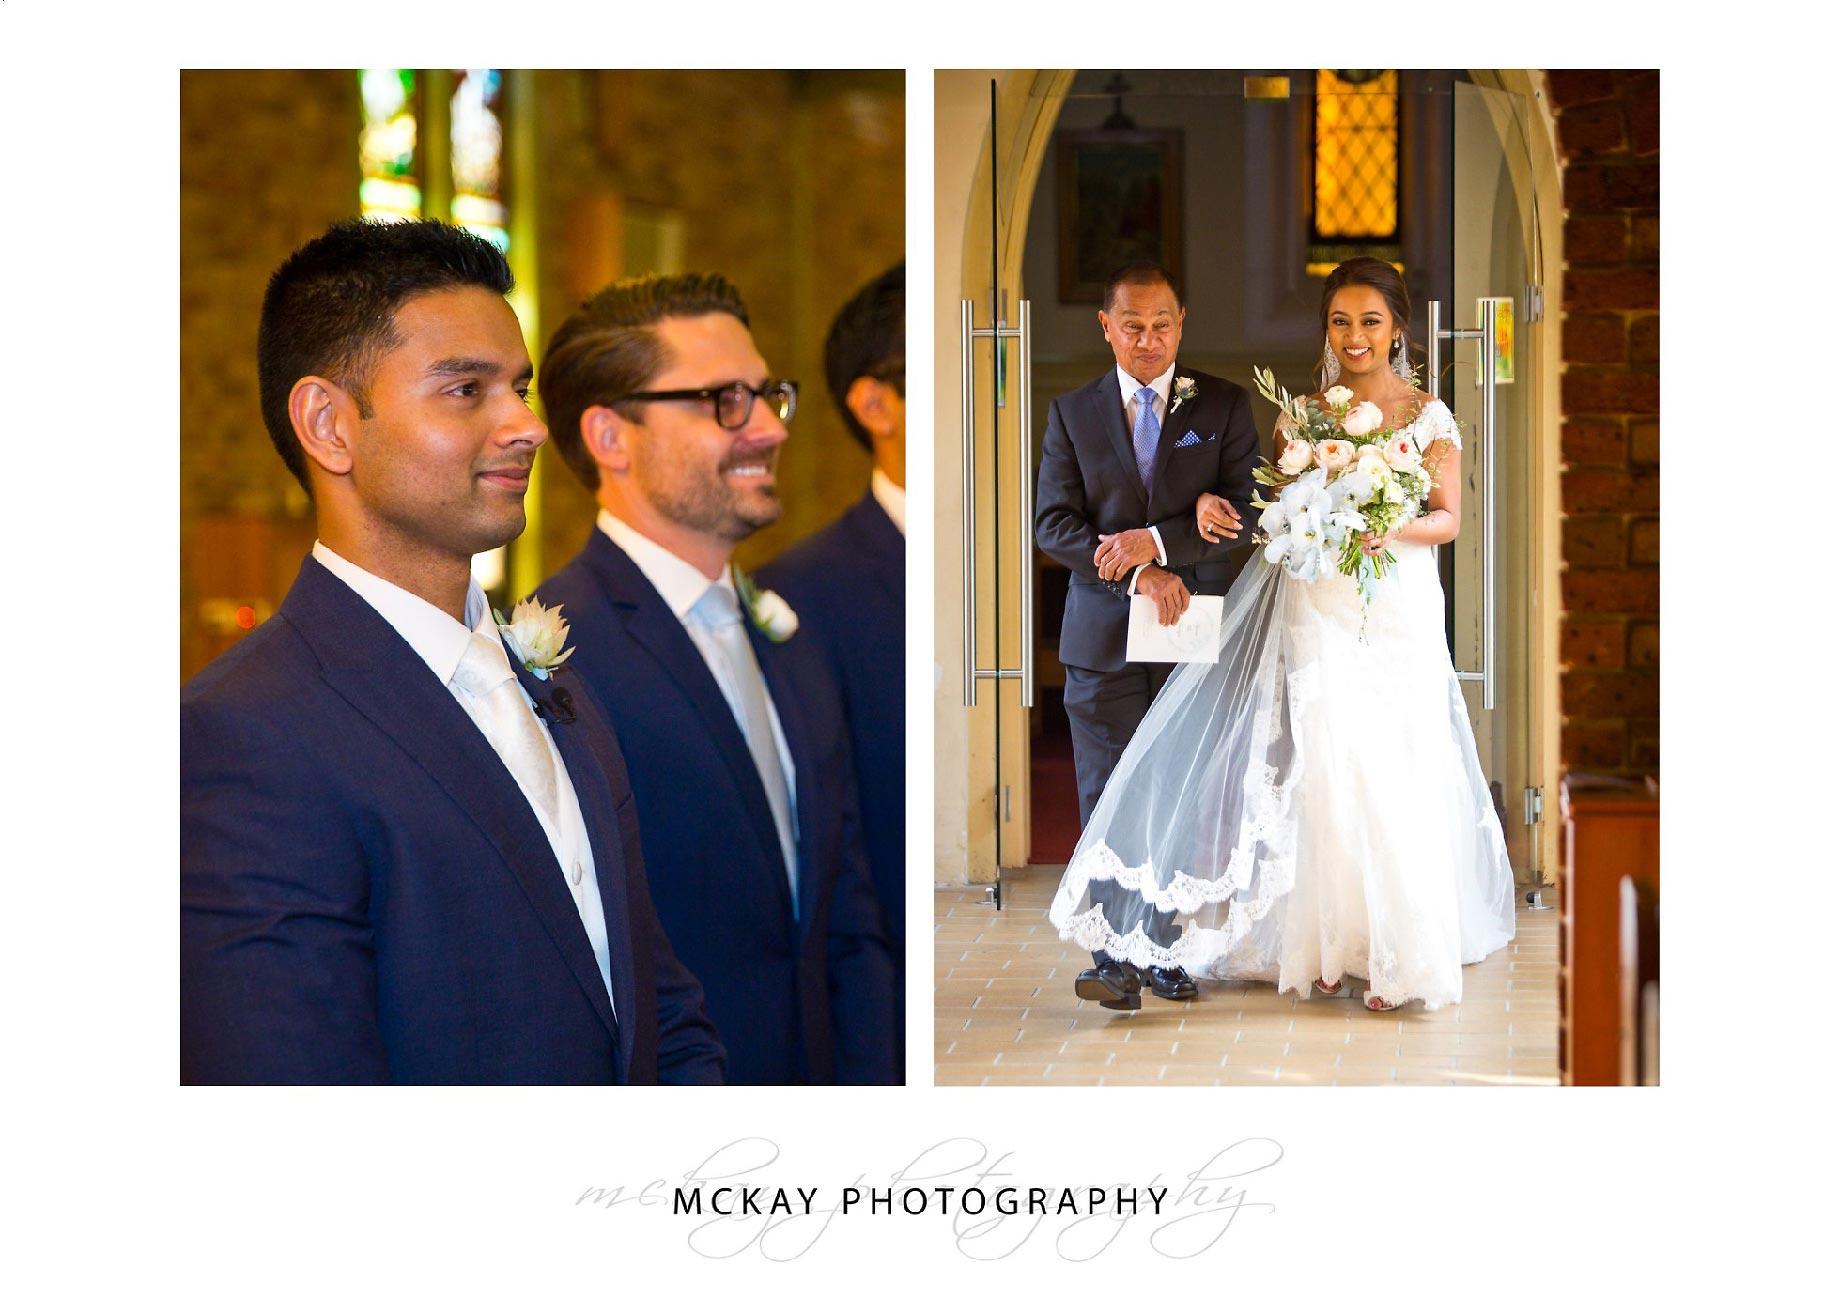 Bride enters church